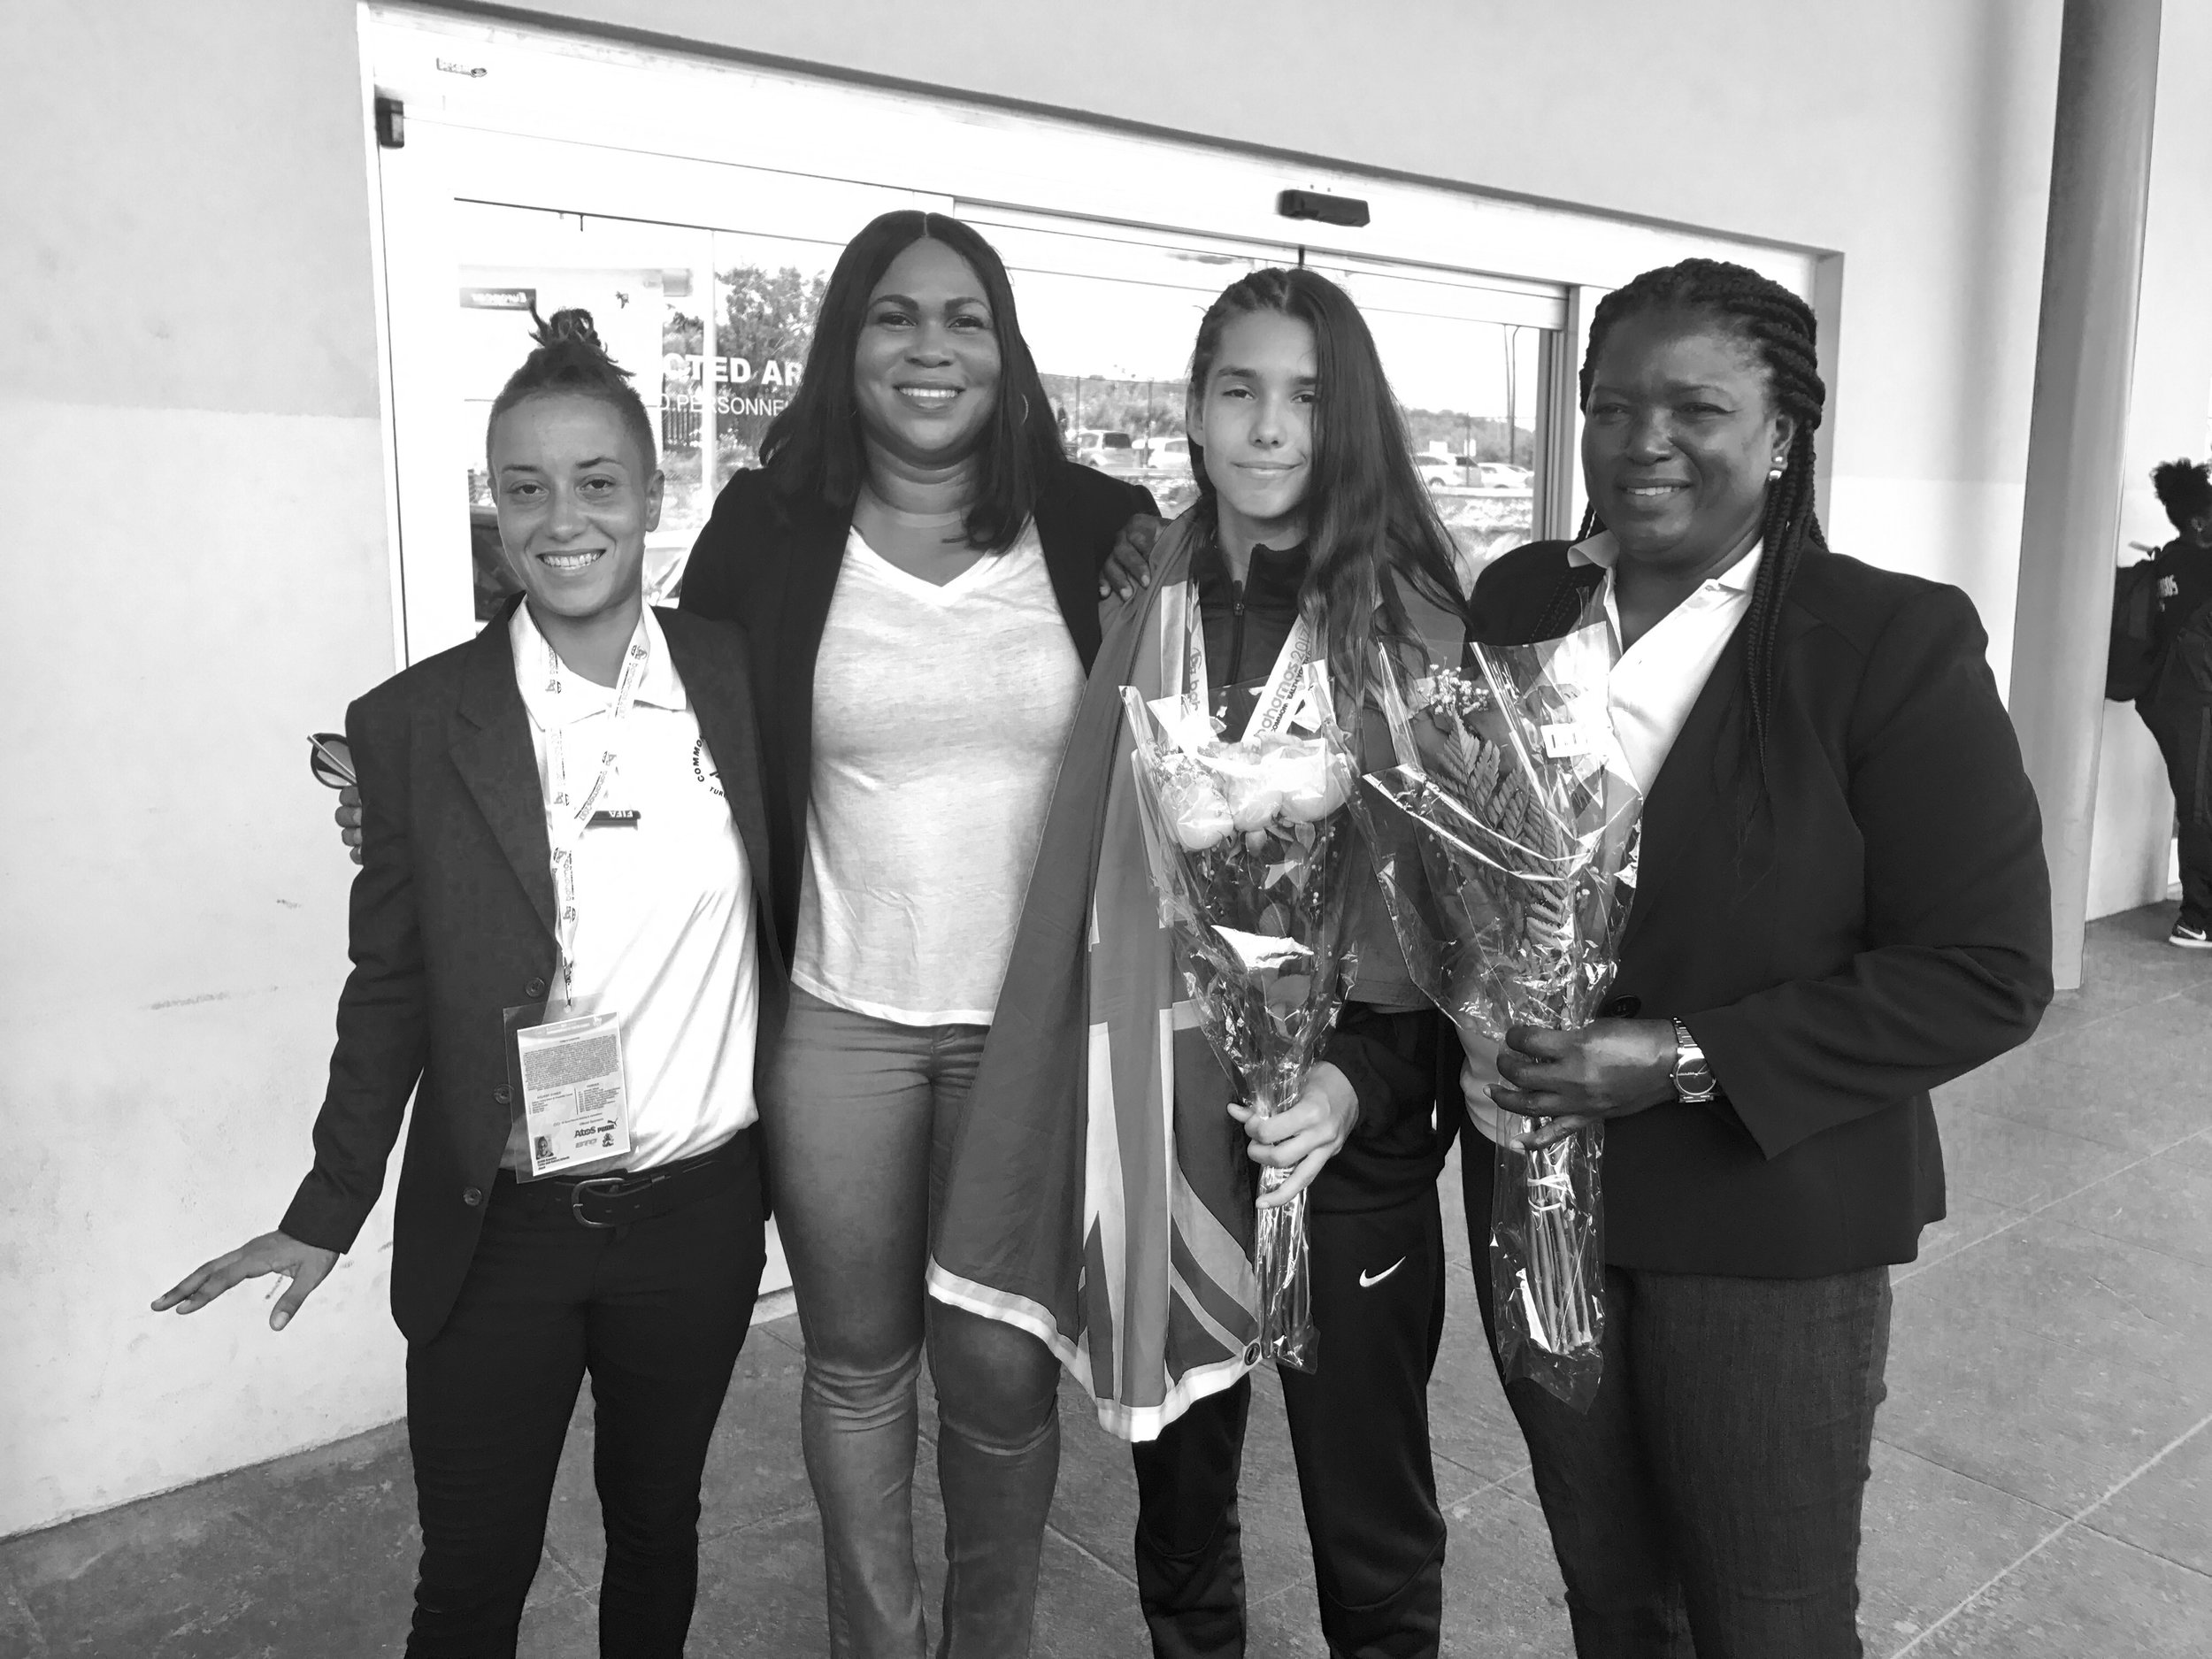 (L-R) Olivia Graveley, Sonia Bien-Aime, Sydnee Campbell, Paula Garland